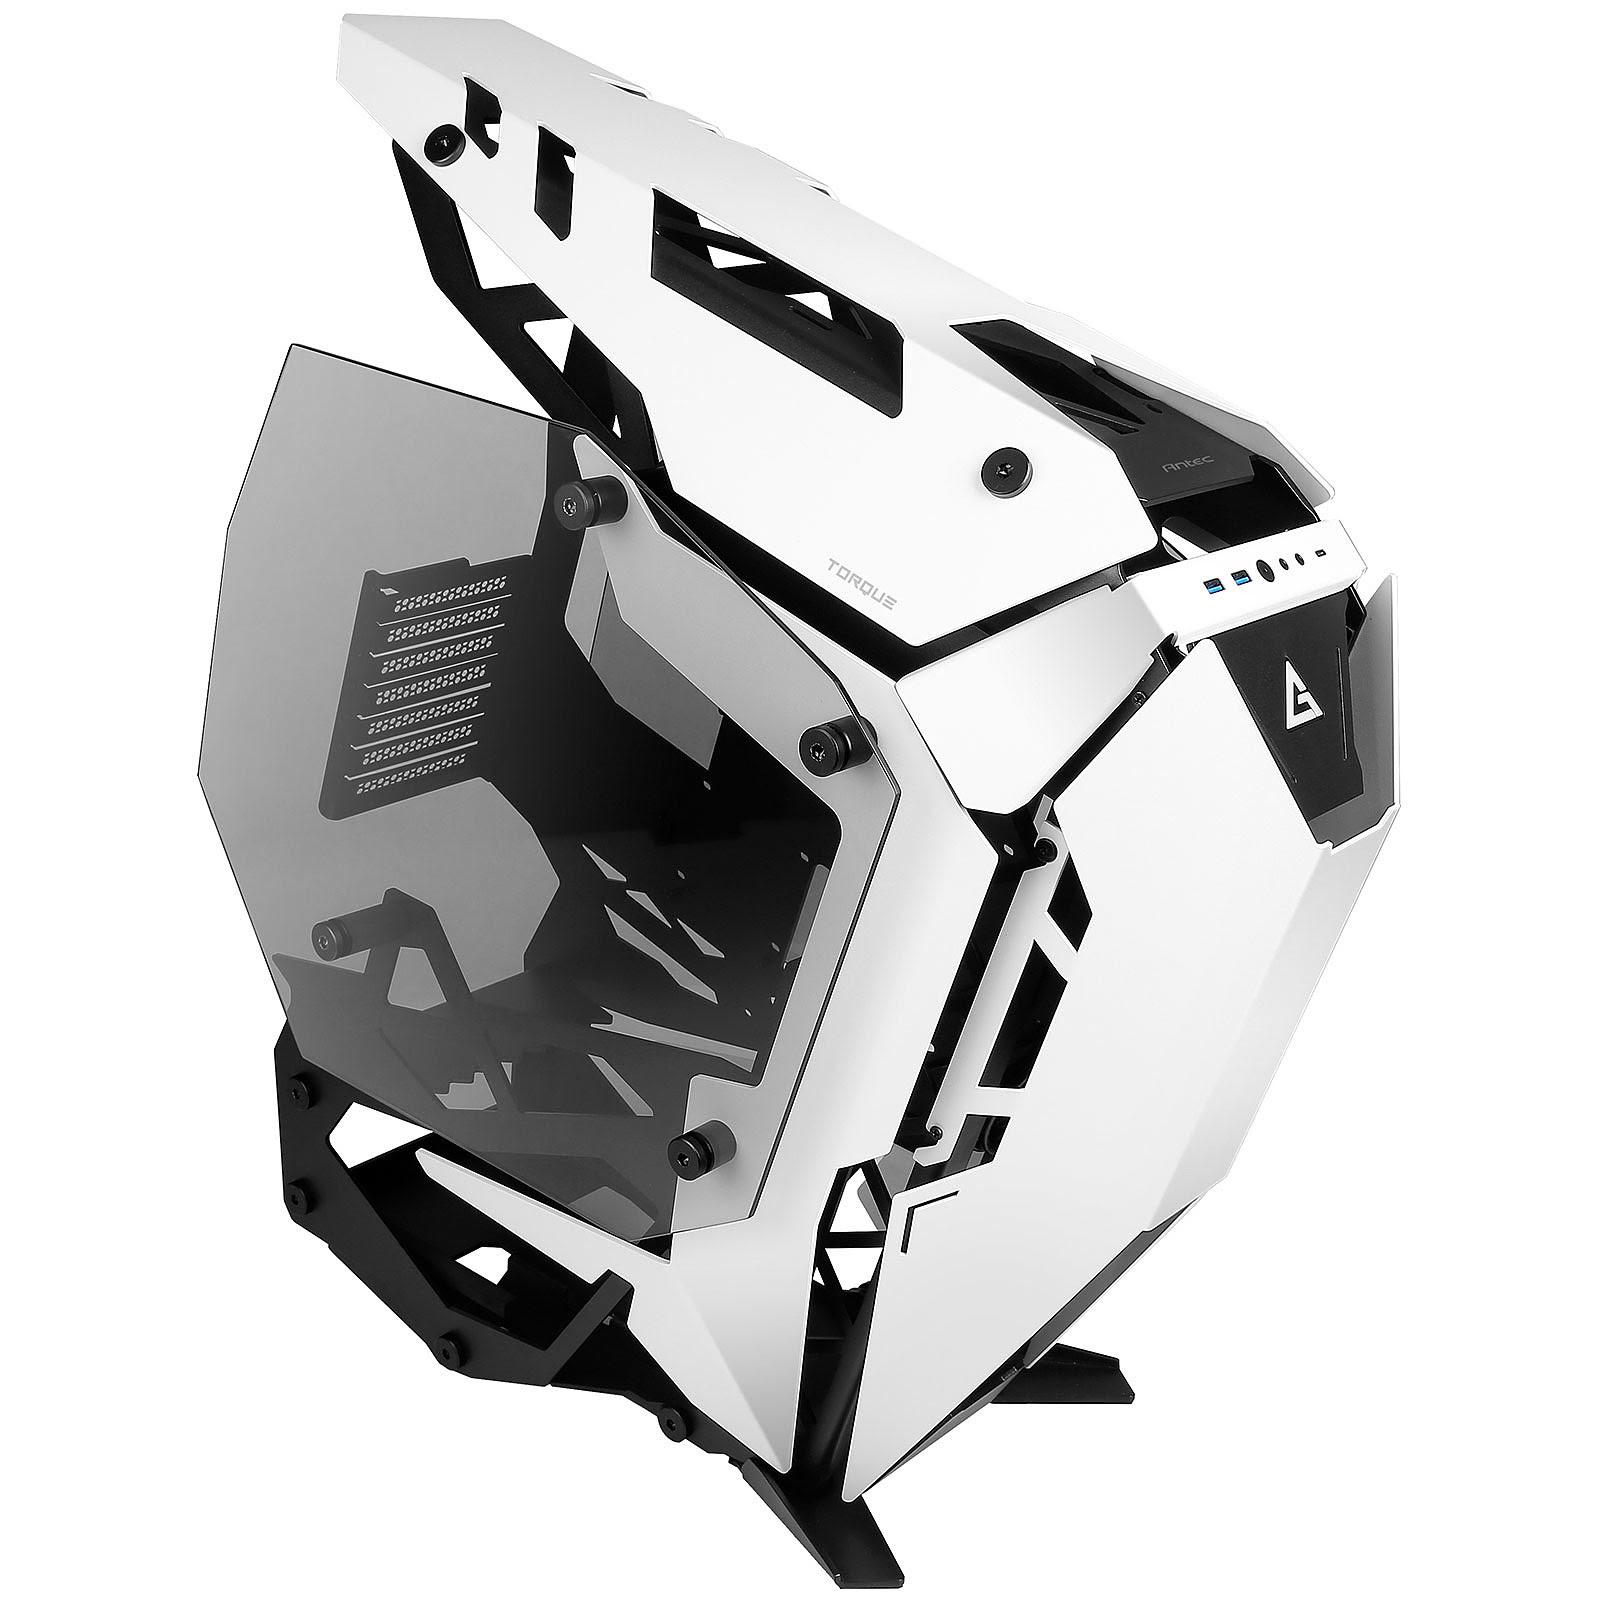 Antec TORQUE Black/White Blanc - Boîtier PC Antec - Cybertek.fr - 0